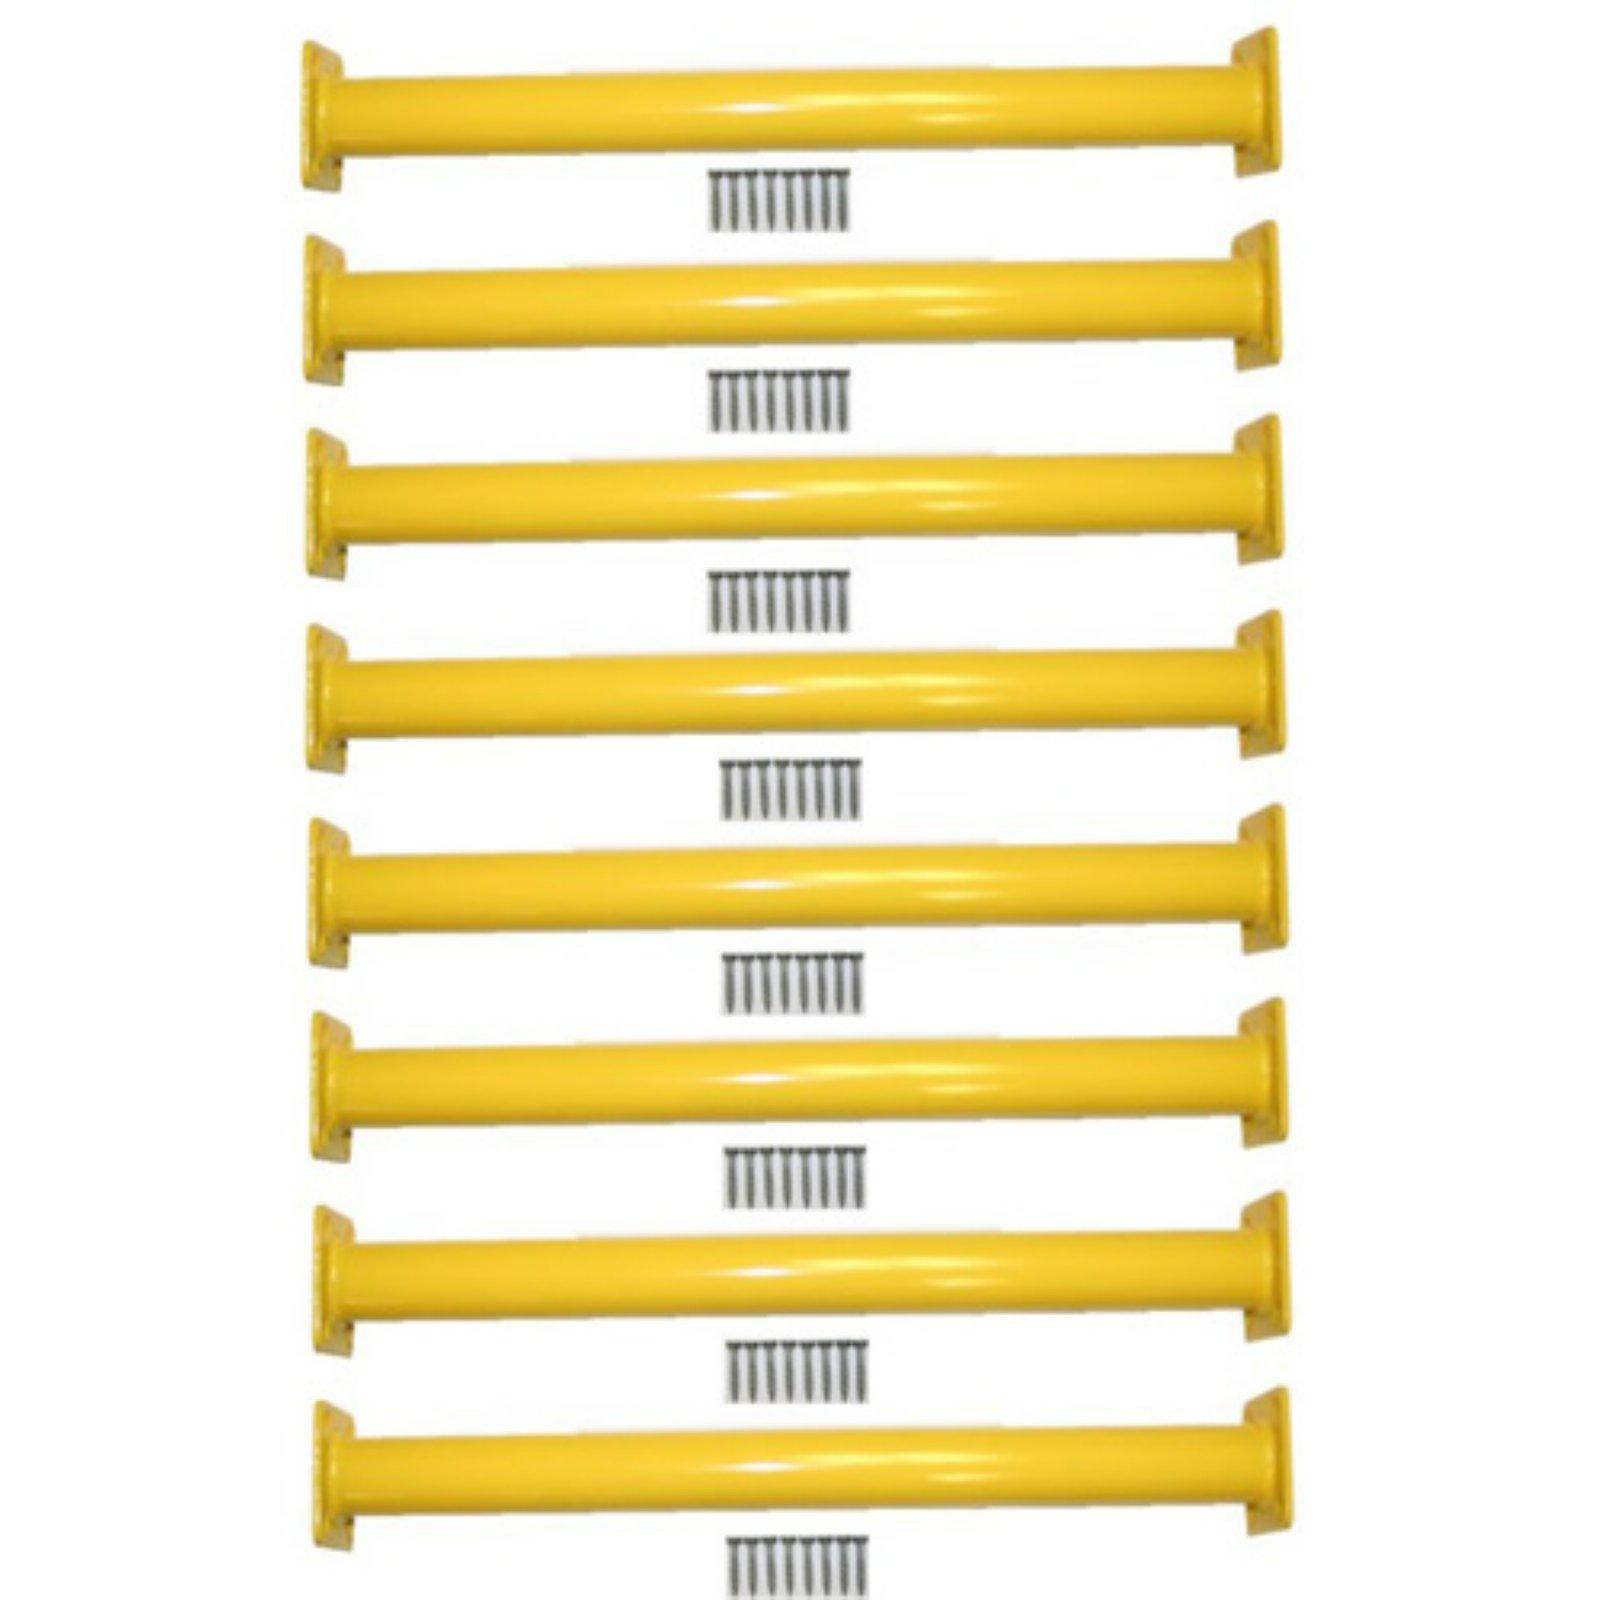 Eastern Jungle Gym Steel Monkey Bar Ladder Rungs 15.13 in. Long - Set of 8